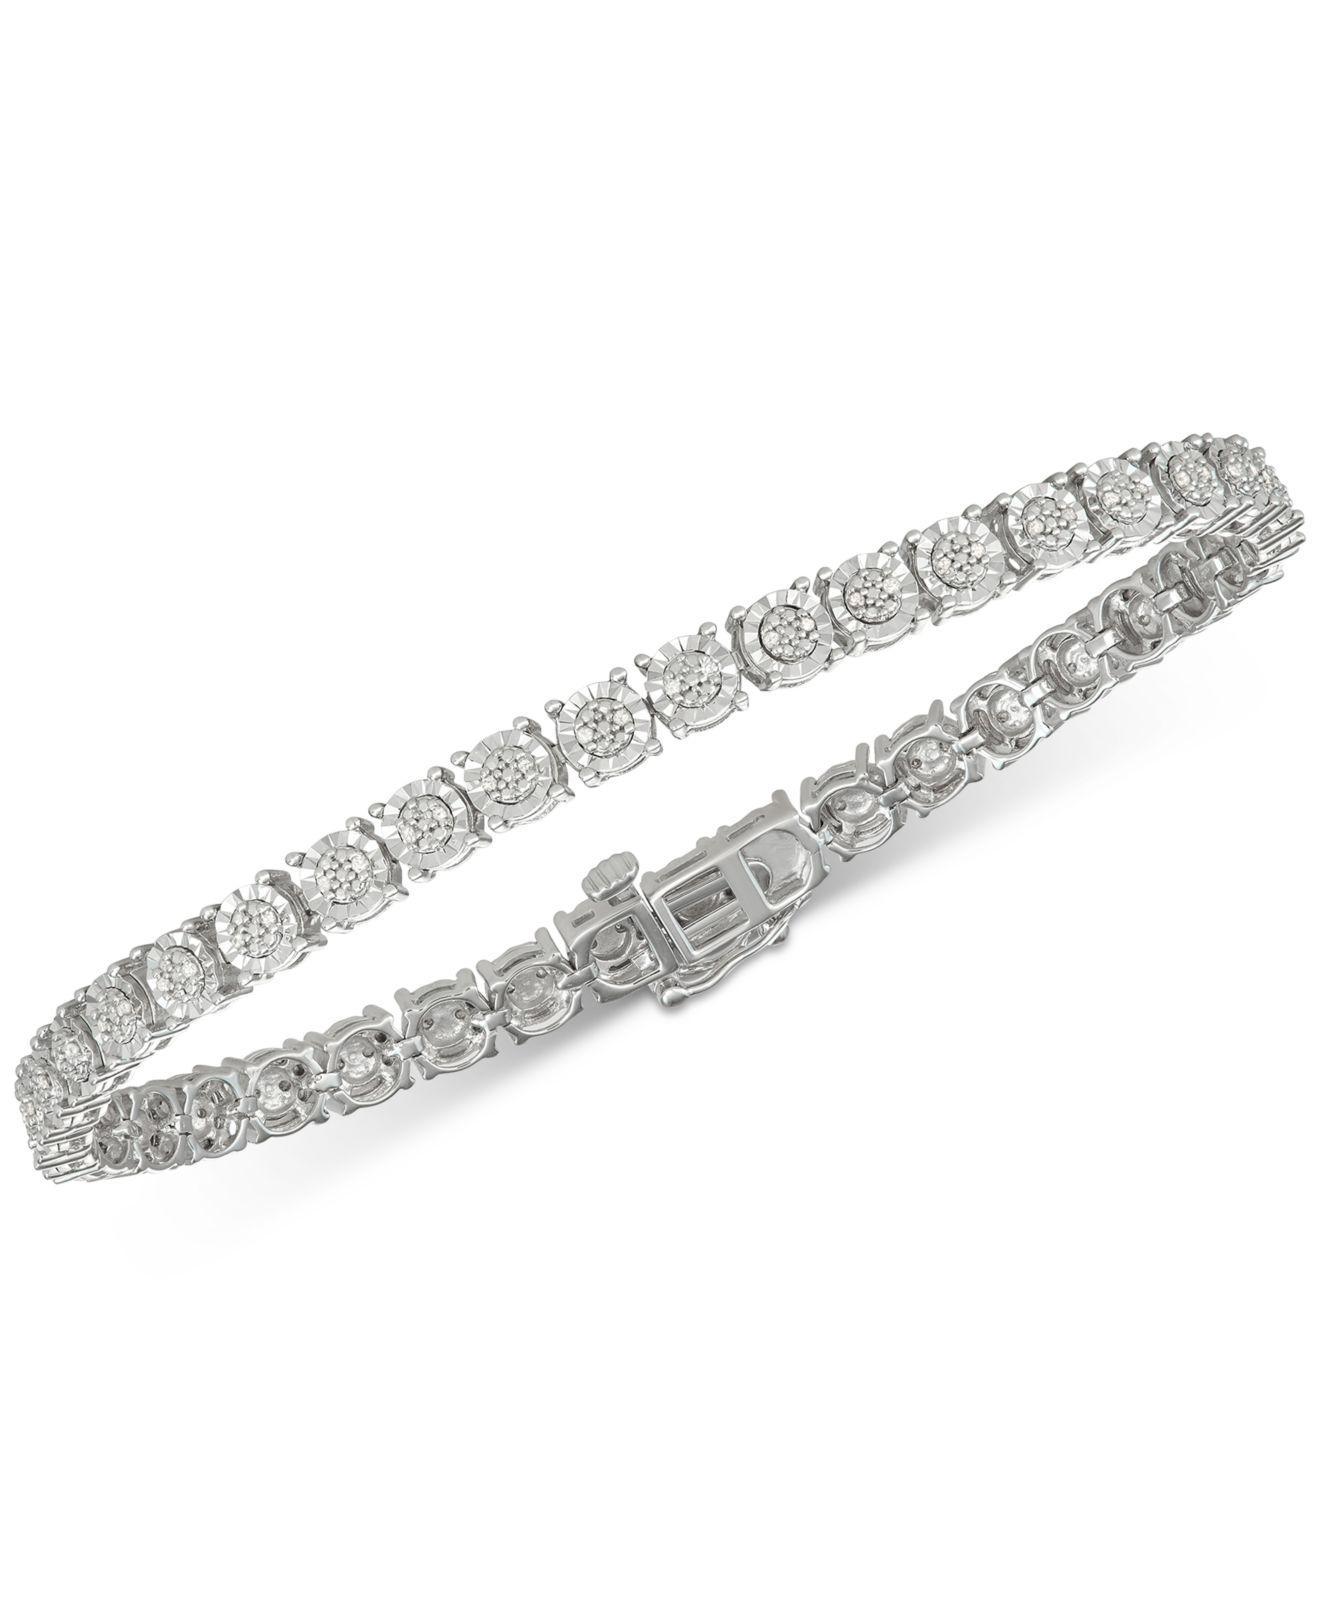 1 Carat TW Macys Tennis Round Diamond Silver Bracelet $200